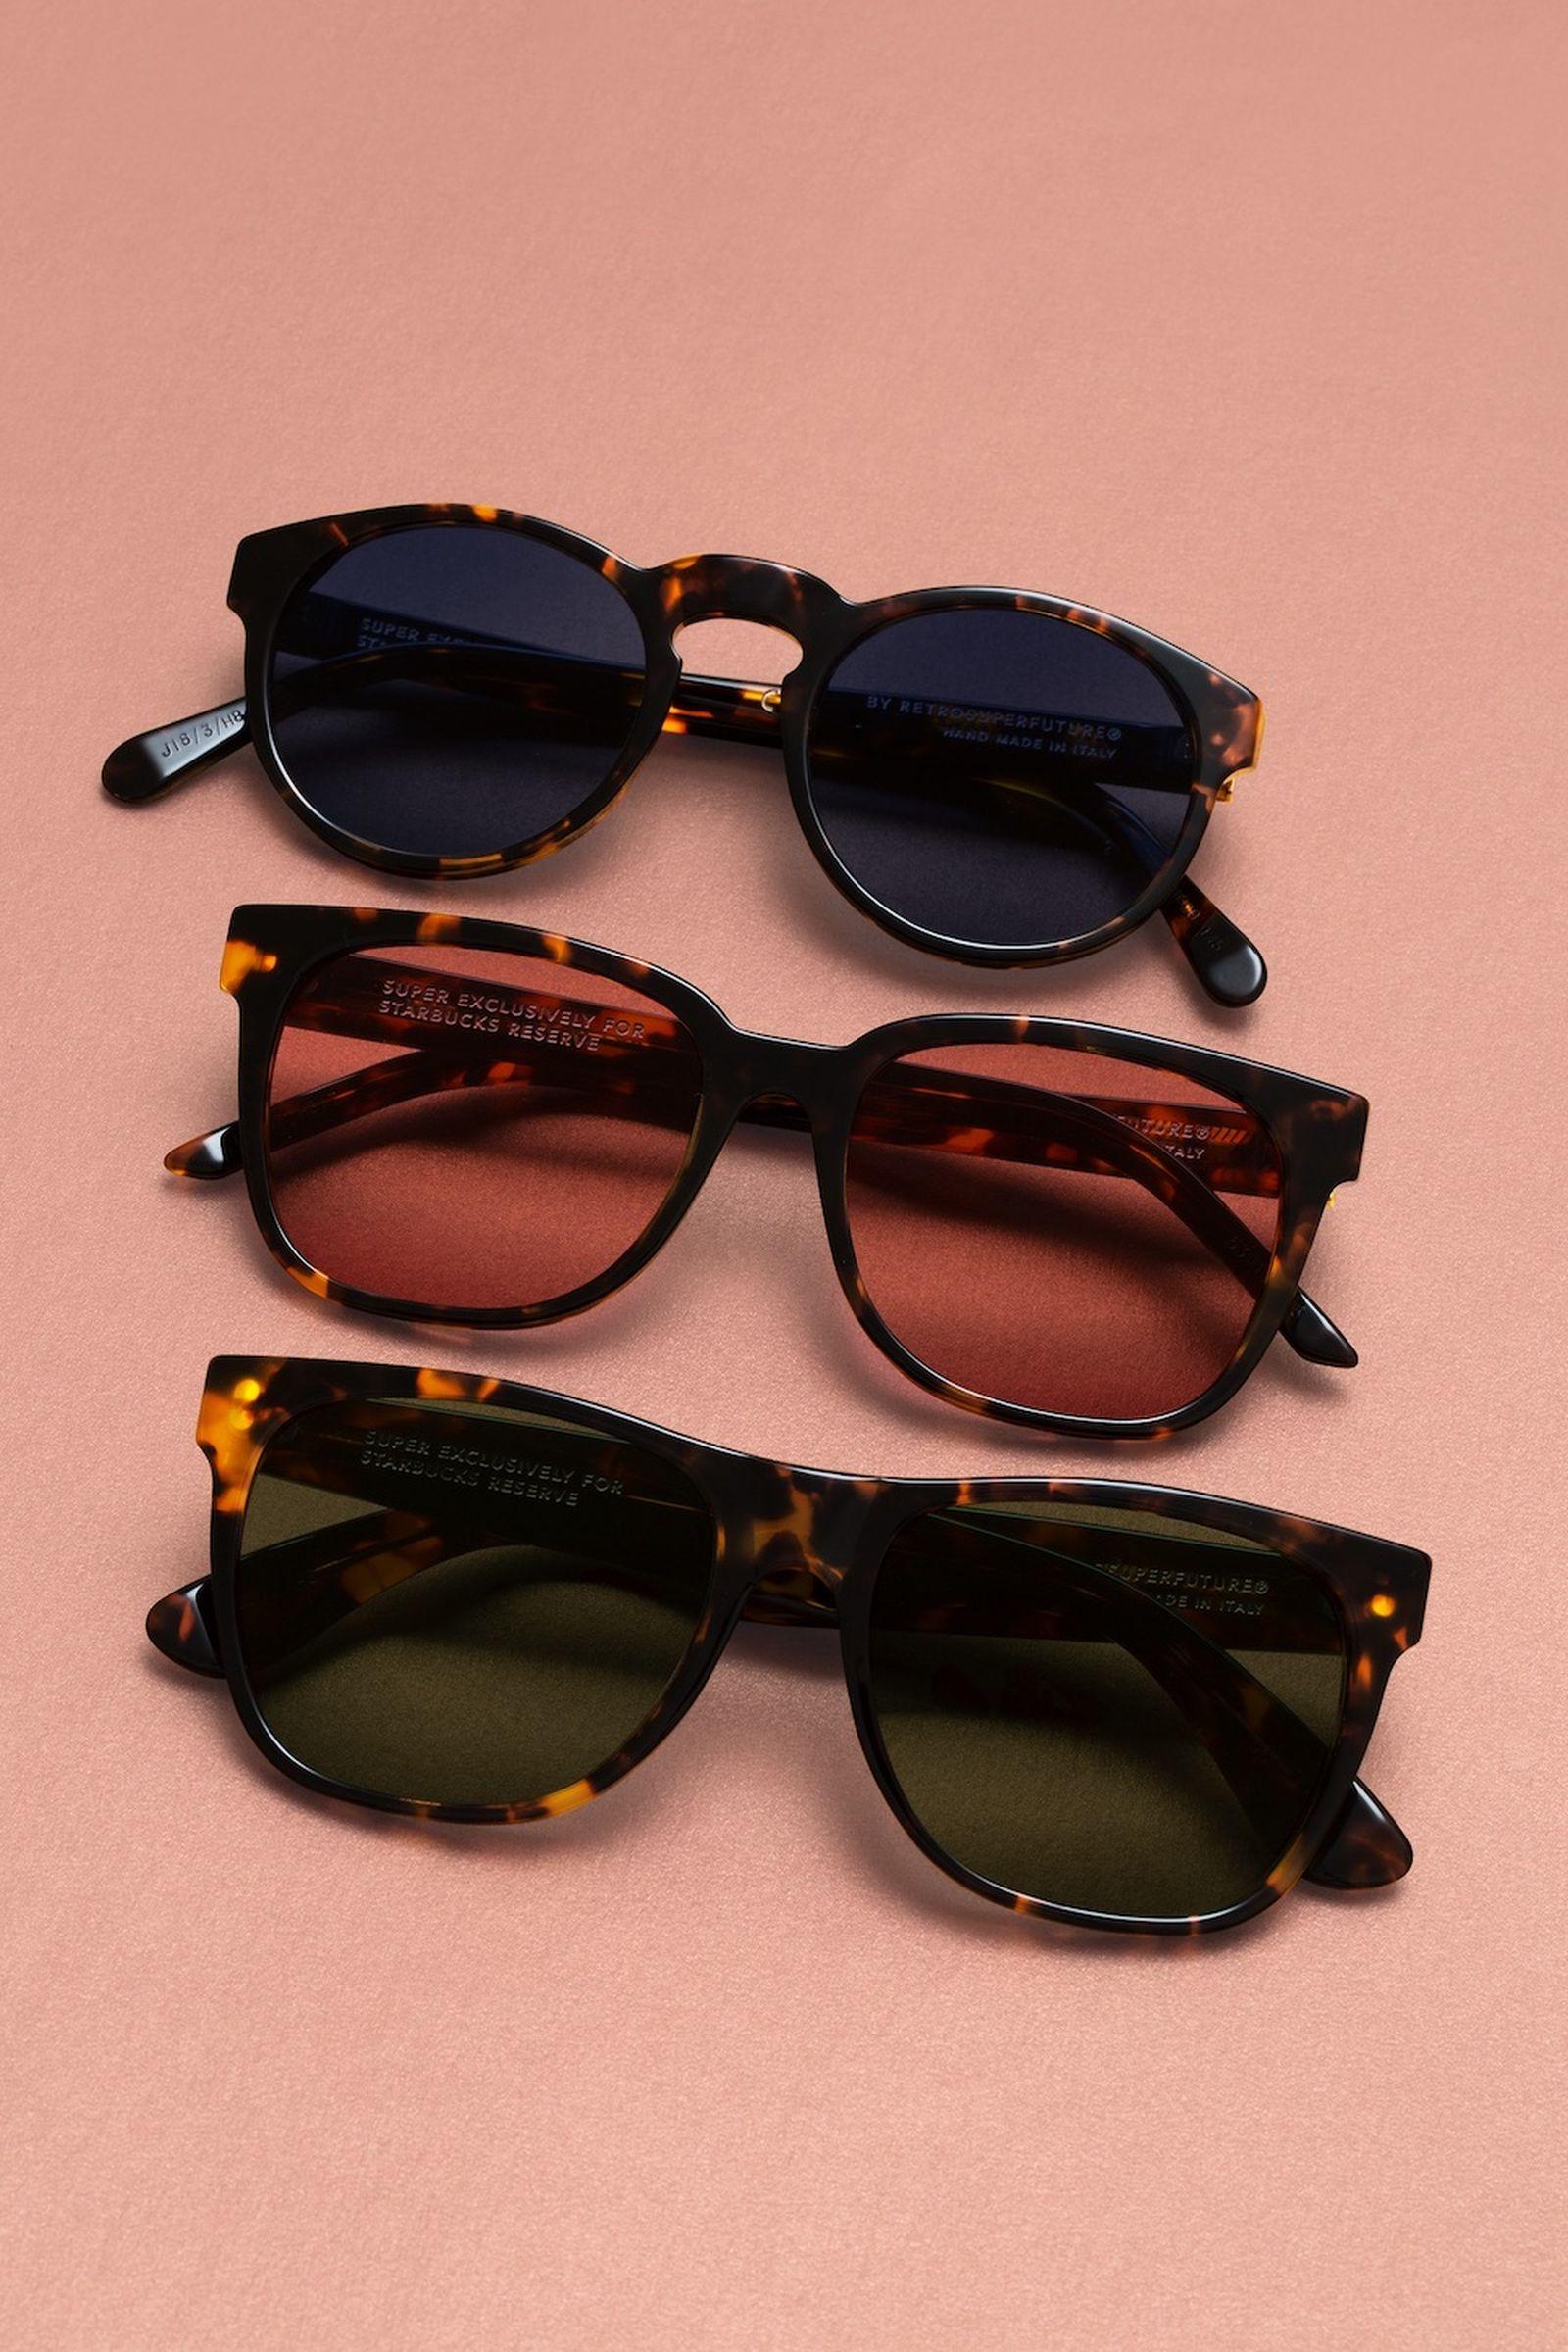 retrosuperfuture starbucks reserve roastery sunglasses SUPER by Retrosuperfuture